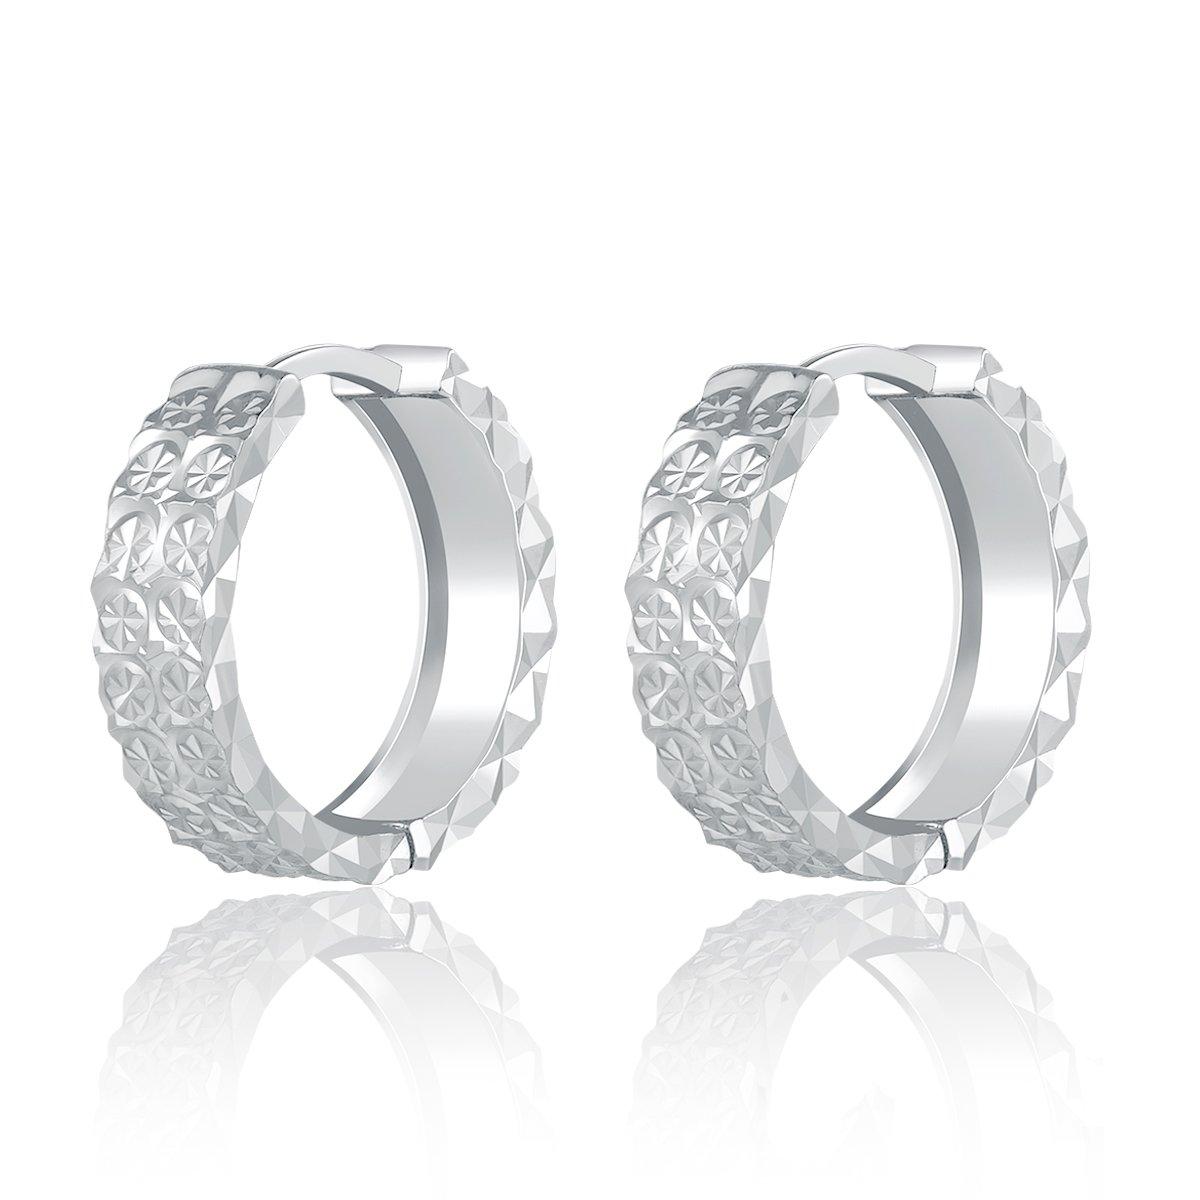 MaBelle 14K White Gold Two Diamond-Cut Thick Band Huggie Hoop Earrings (Diameter 0.6'')